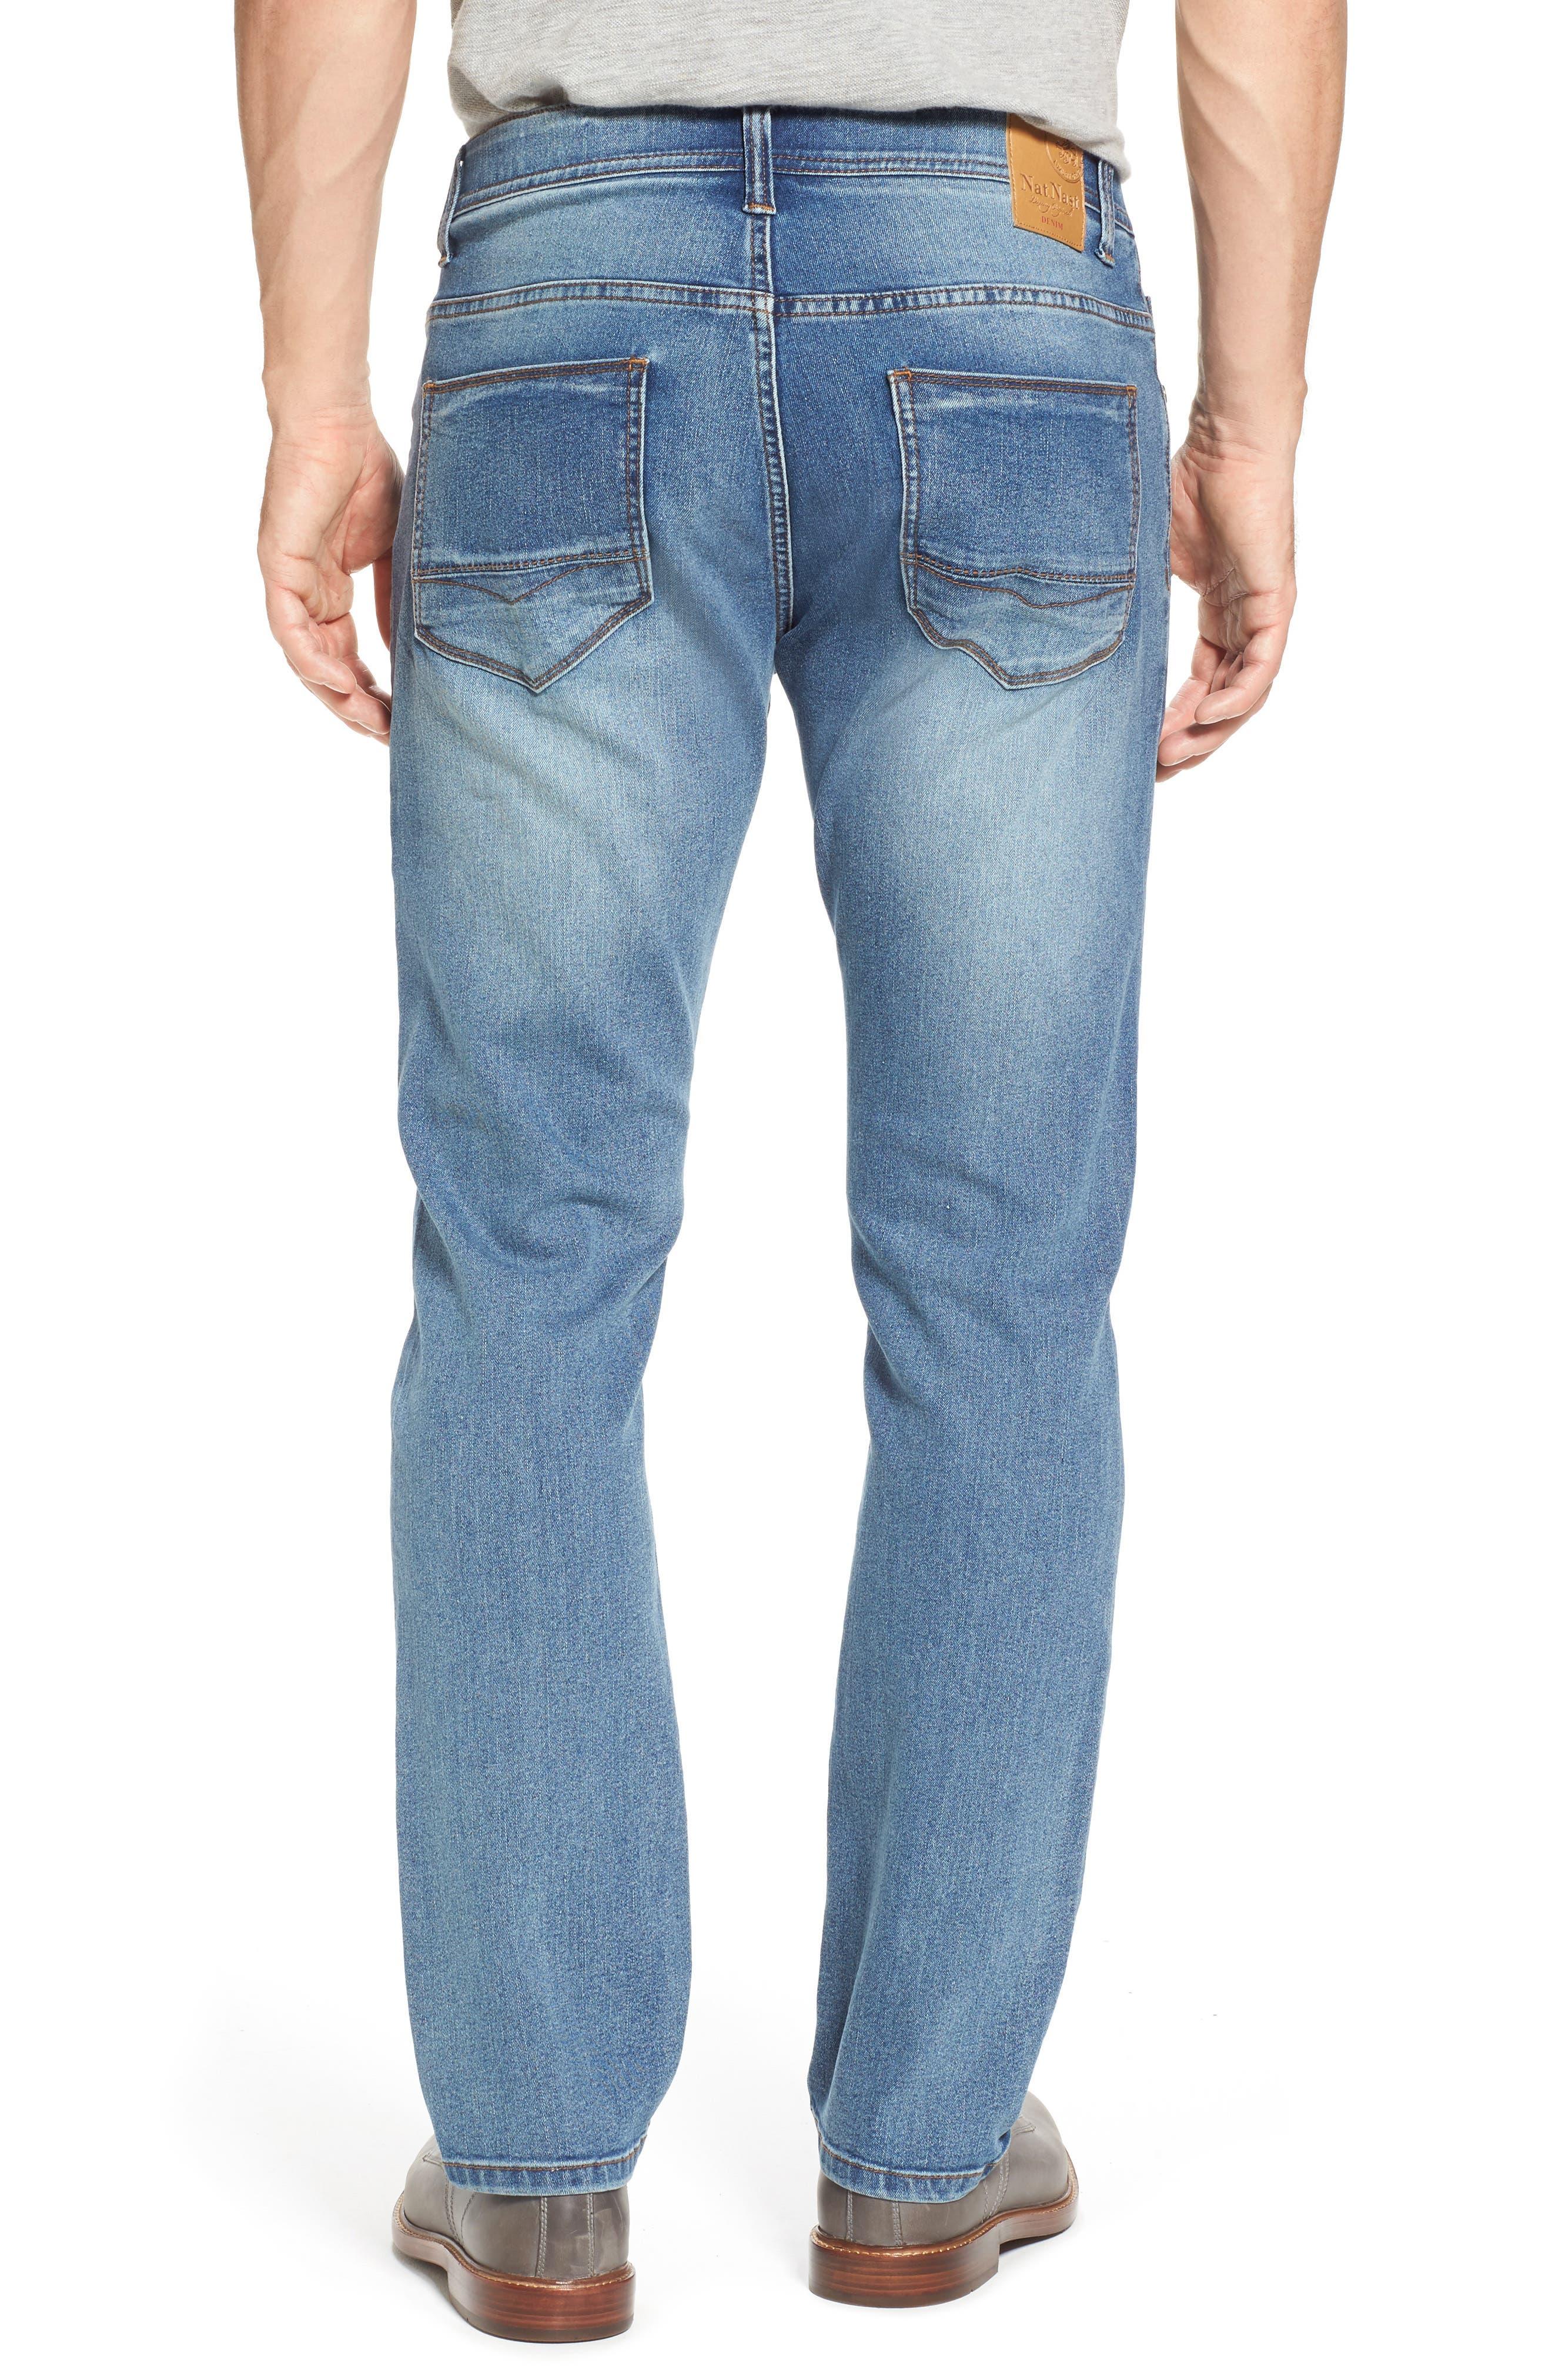 Maverick Stretch Slim Fit Jeans,                             Alternate thumbnail 2, color,                             Beach Wash